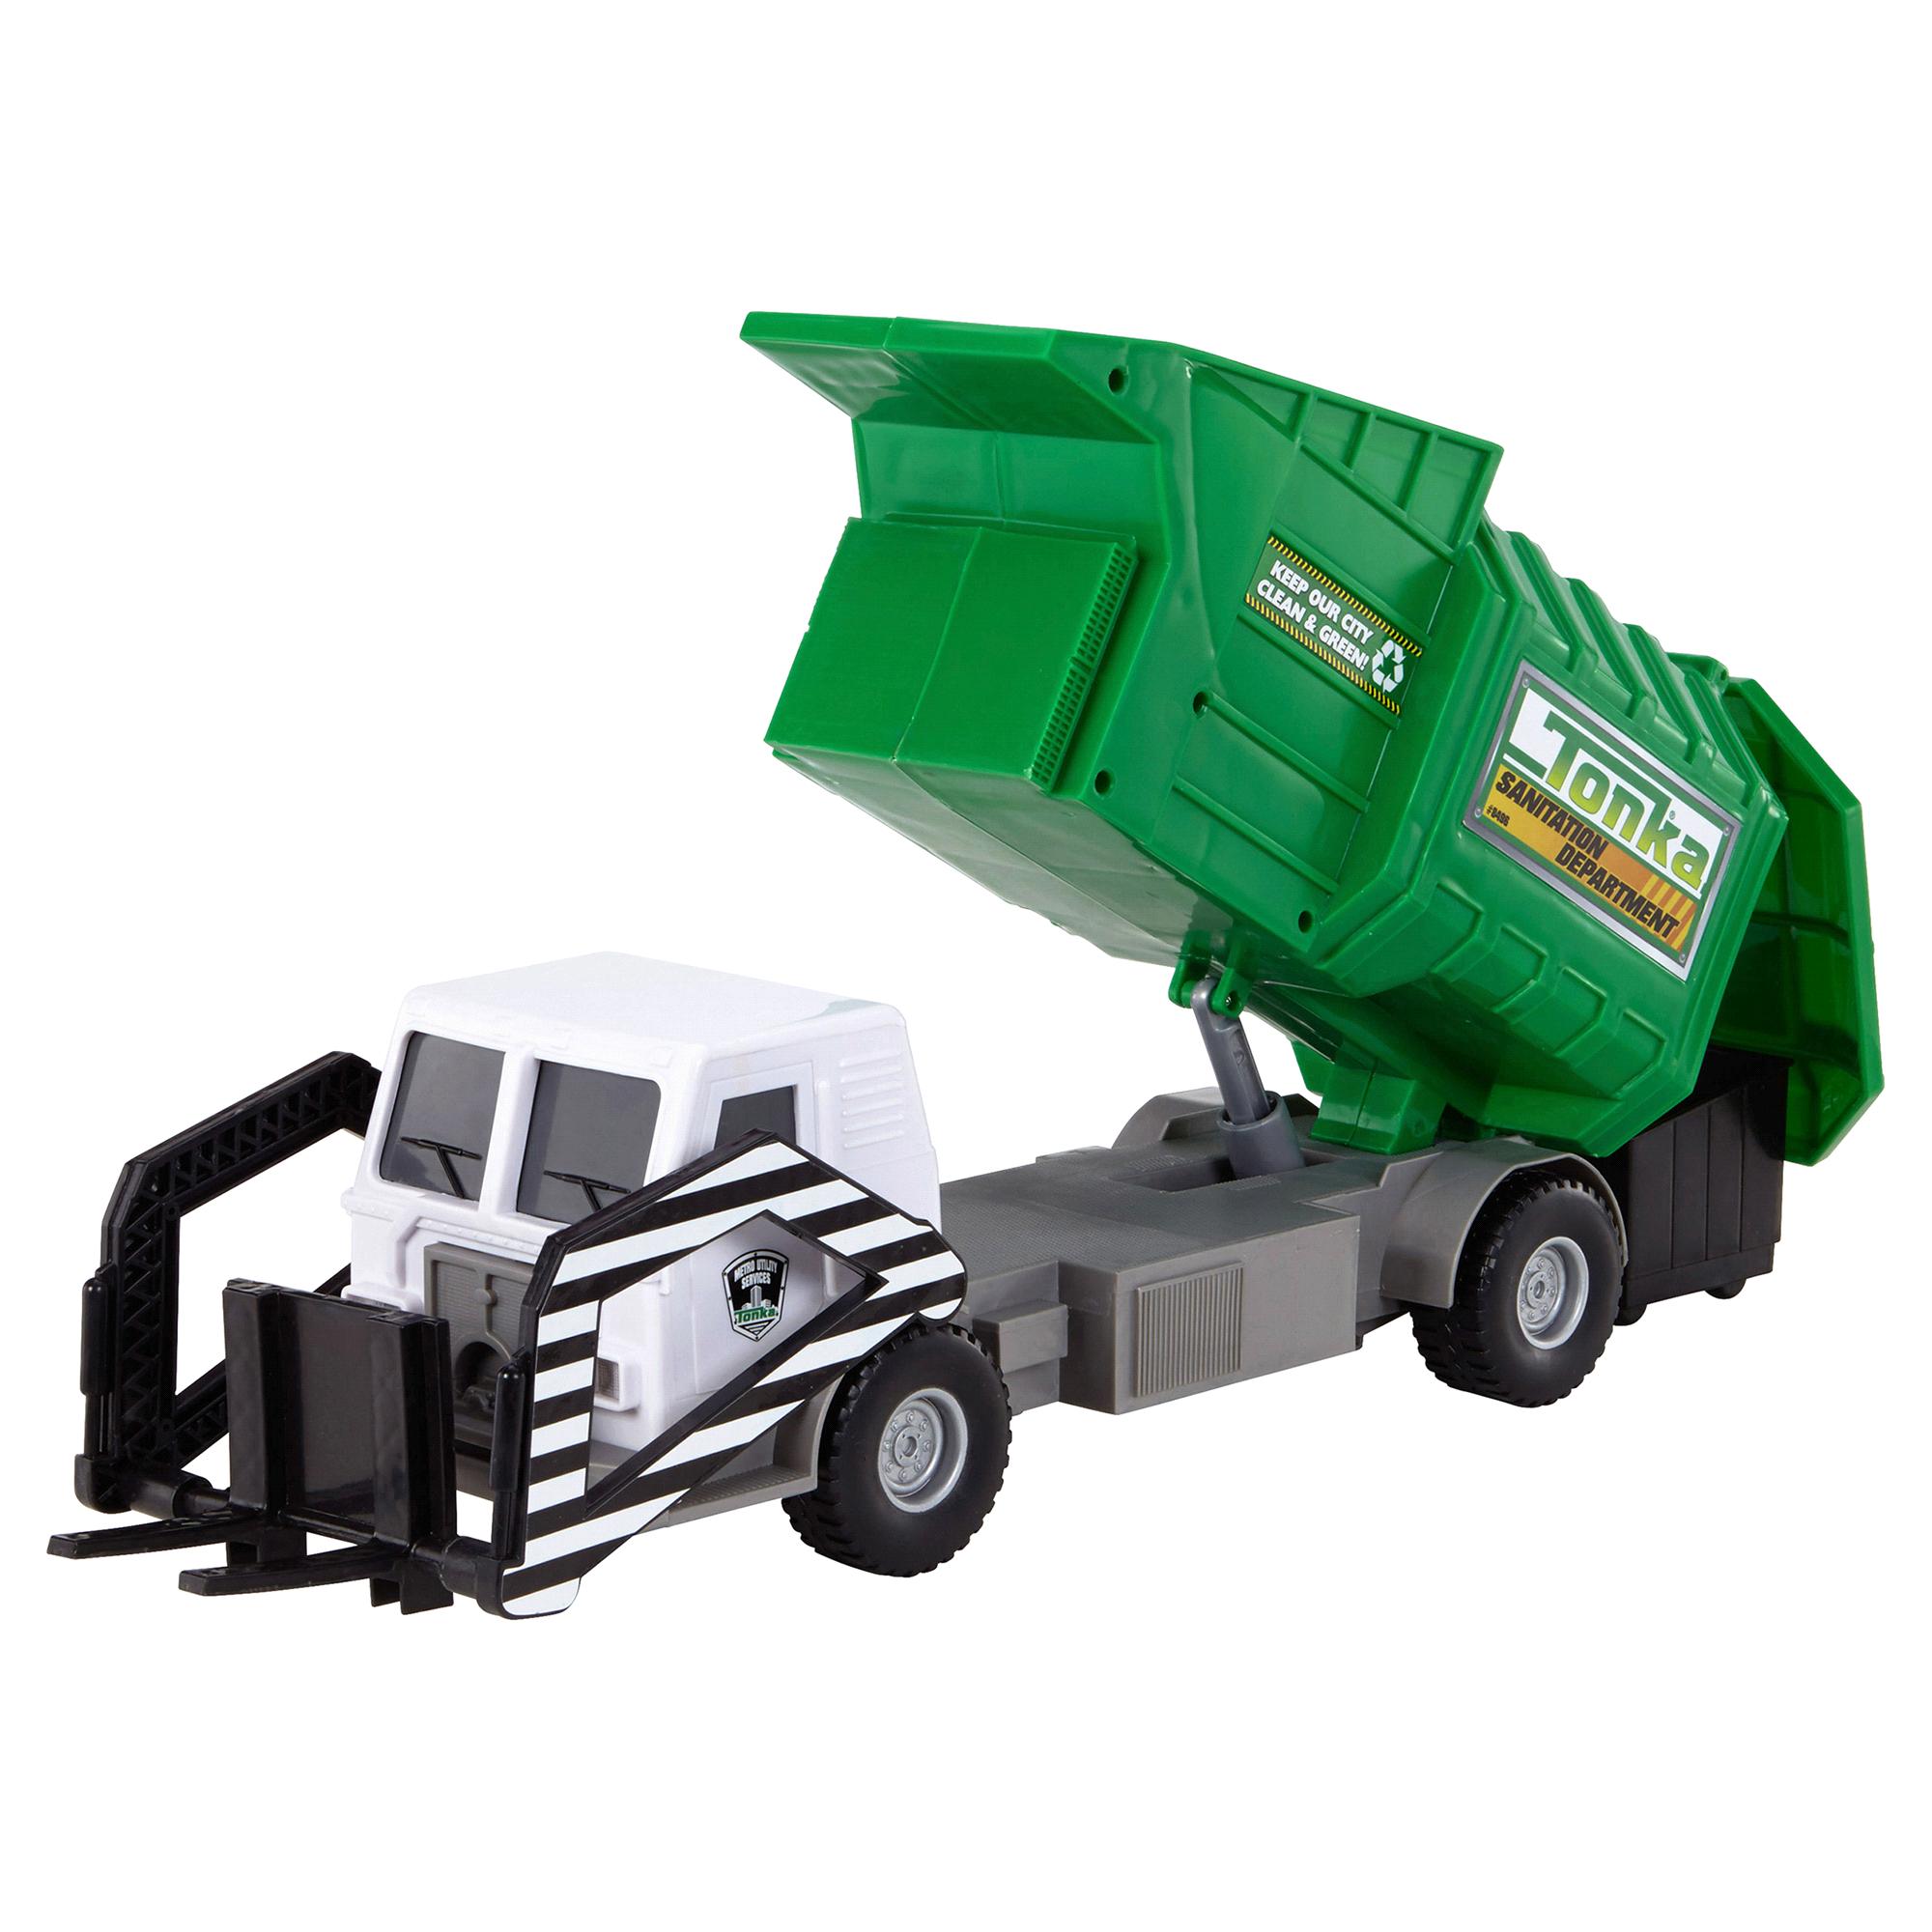 Tonka Mighty Motorized Garbage Truck | Meijer.com